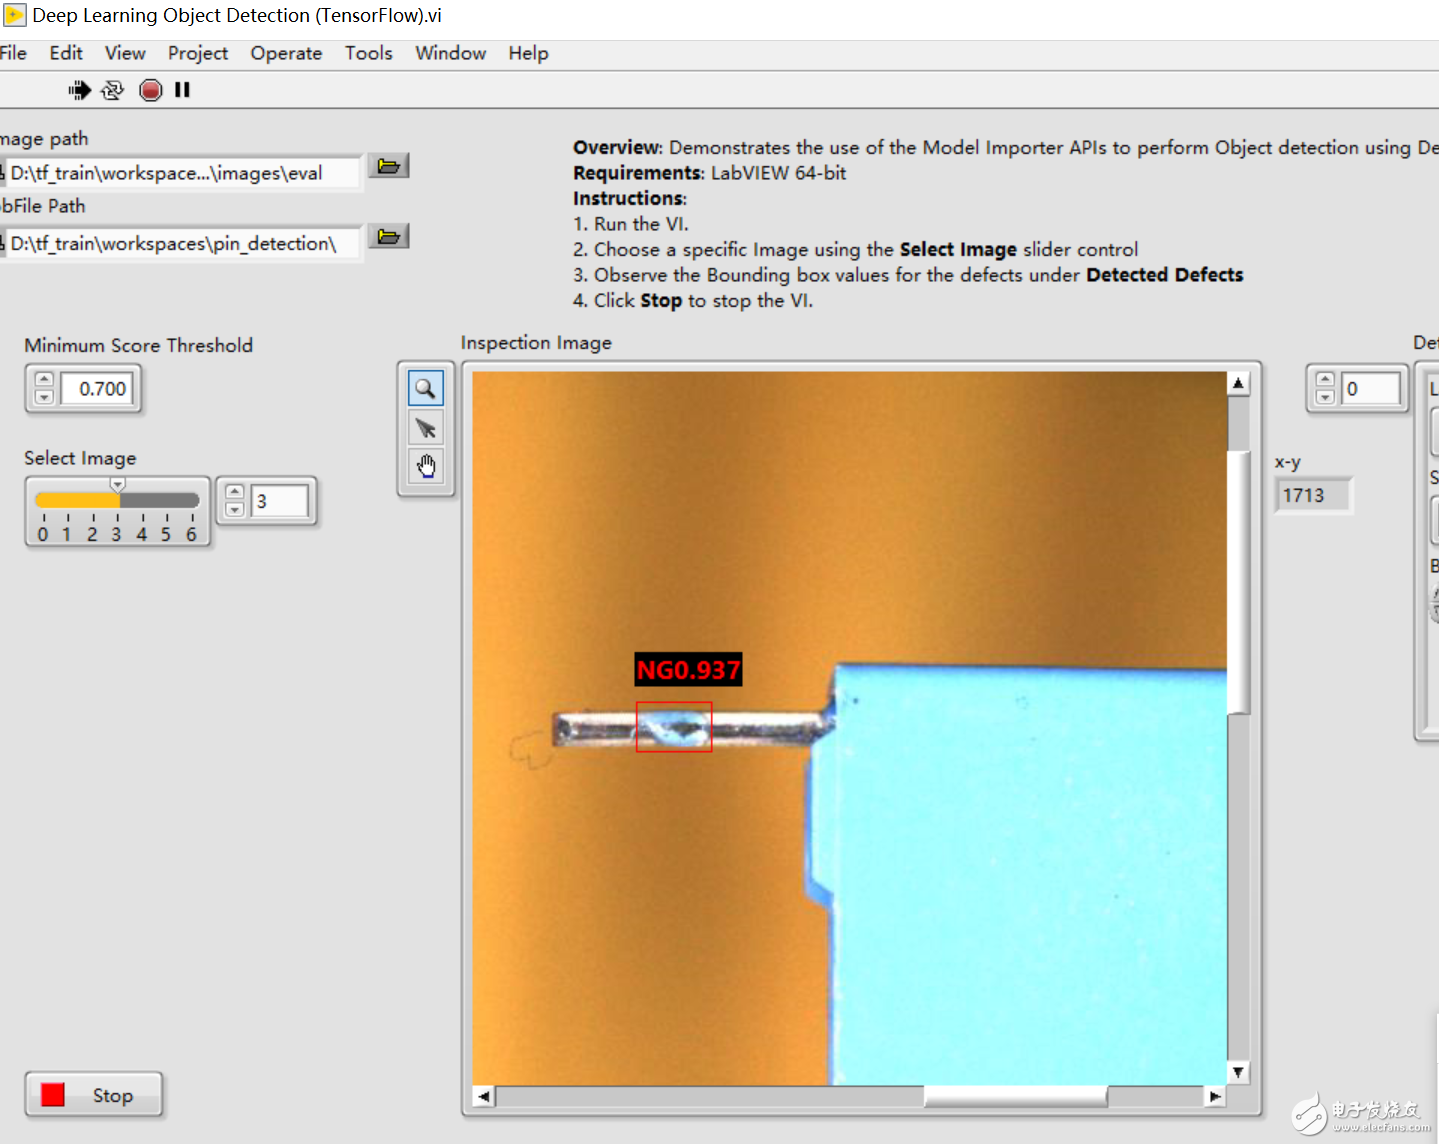 labview调用深度学习tensorflow模型非常简单,附上源码和模型